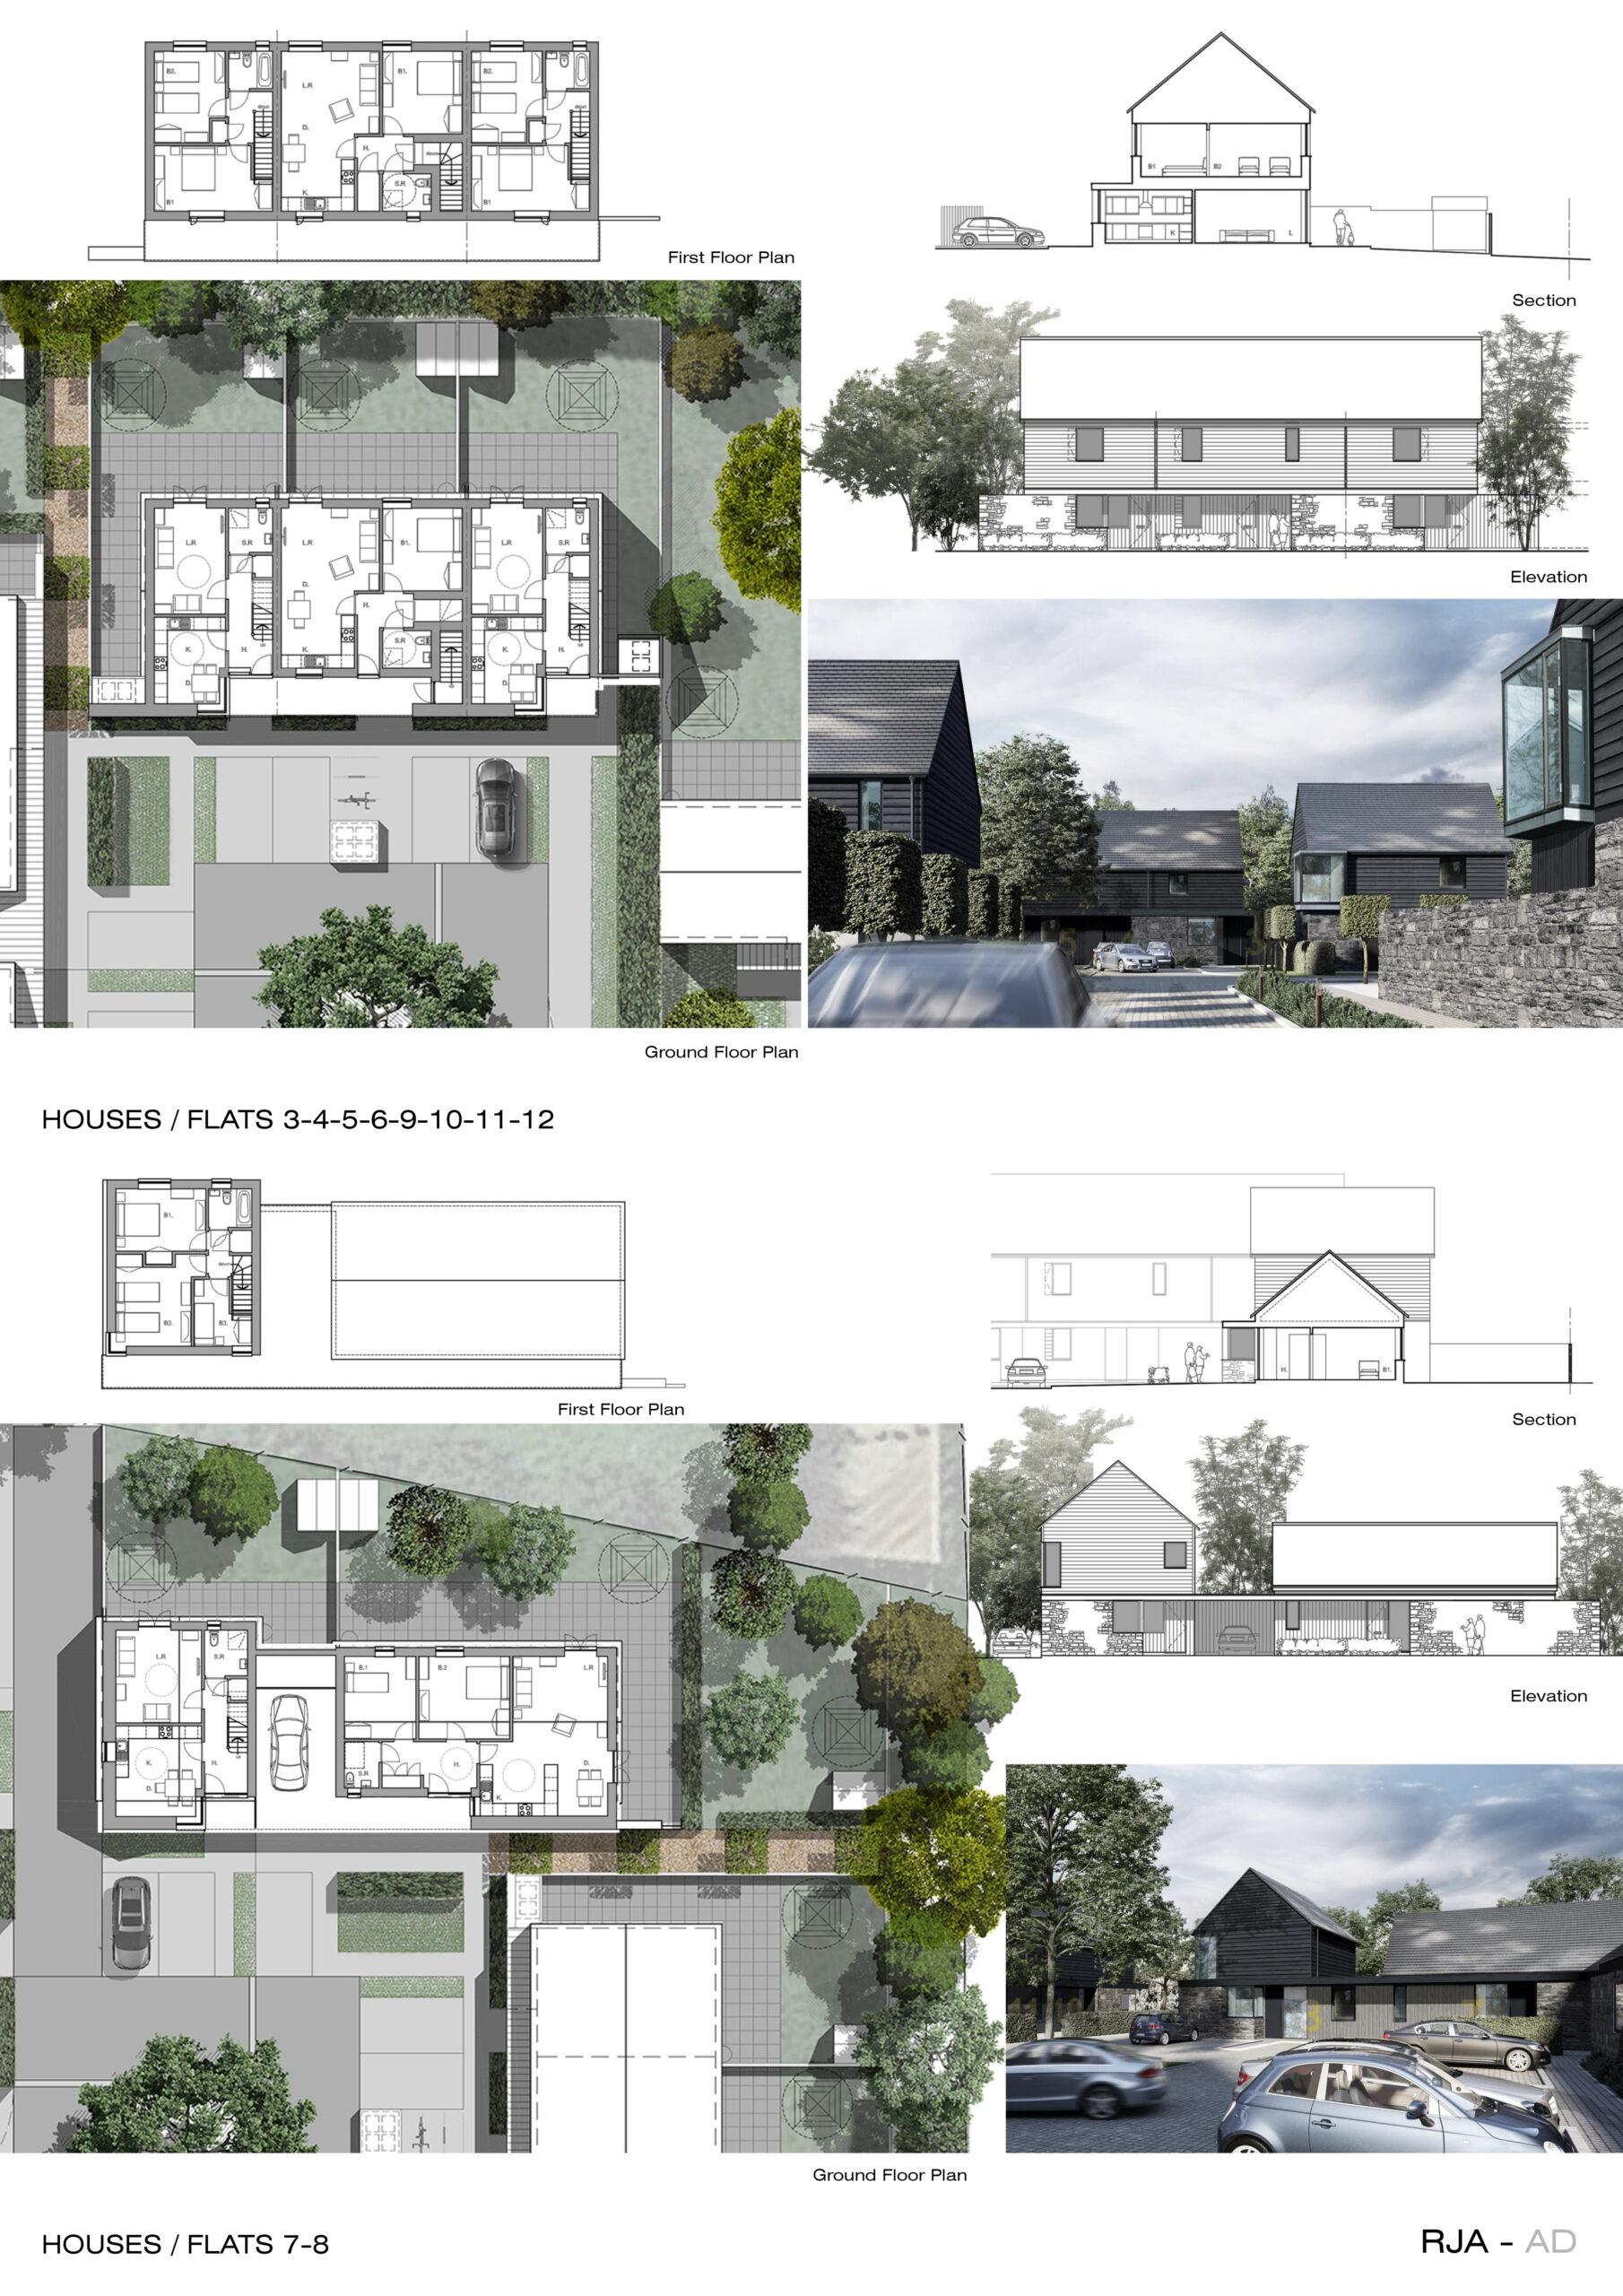 Architectural Design of the Cwrt Canna site in Bridgend